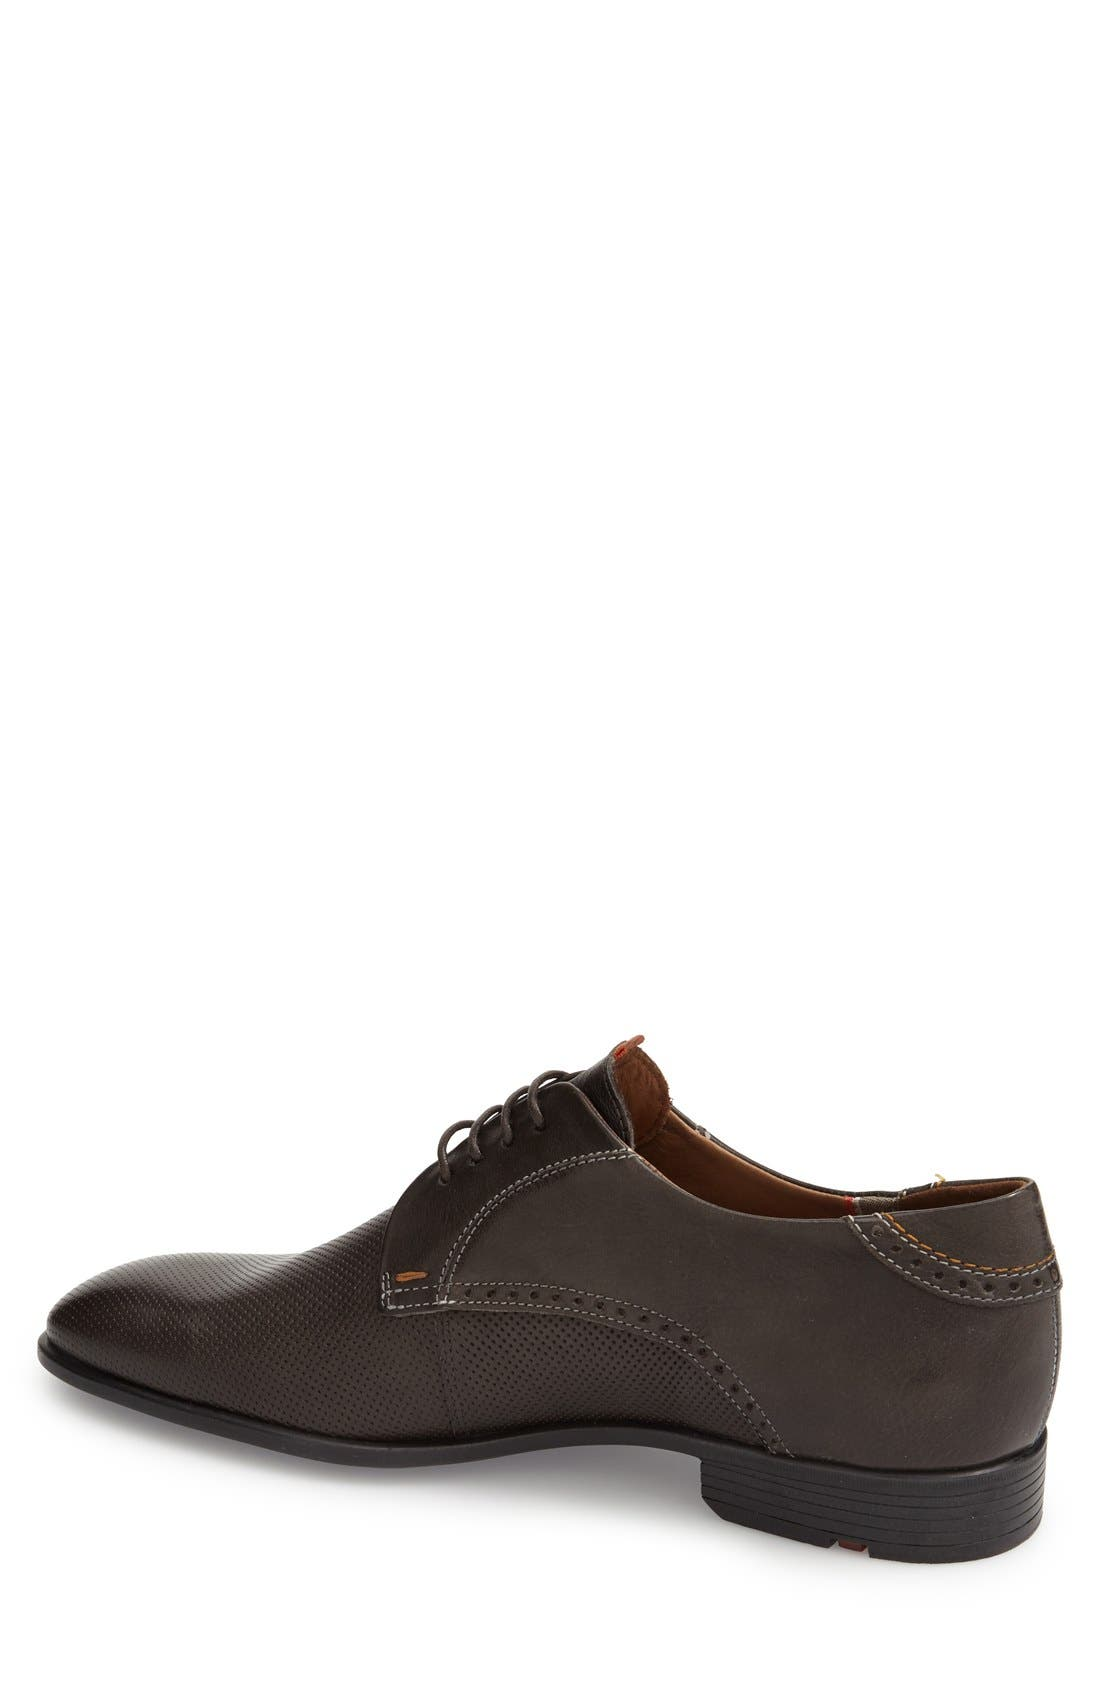 'Dello' Plain Toe Derby,                             Alternate thumbnail 2, color,                             Grey